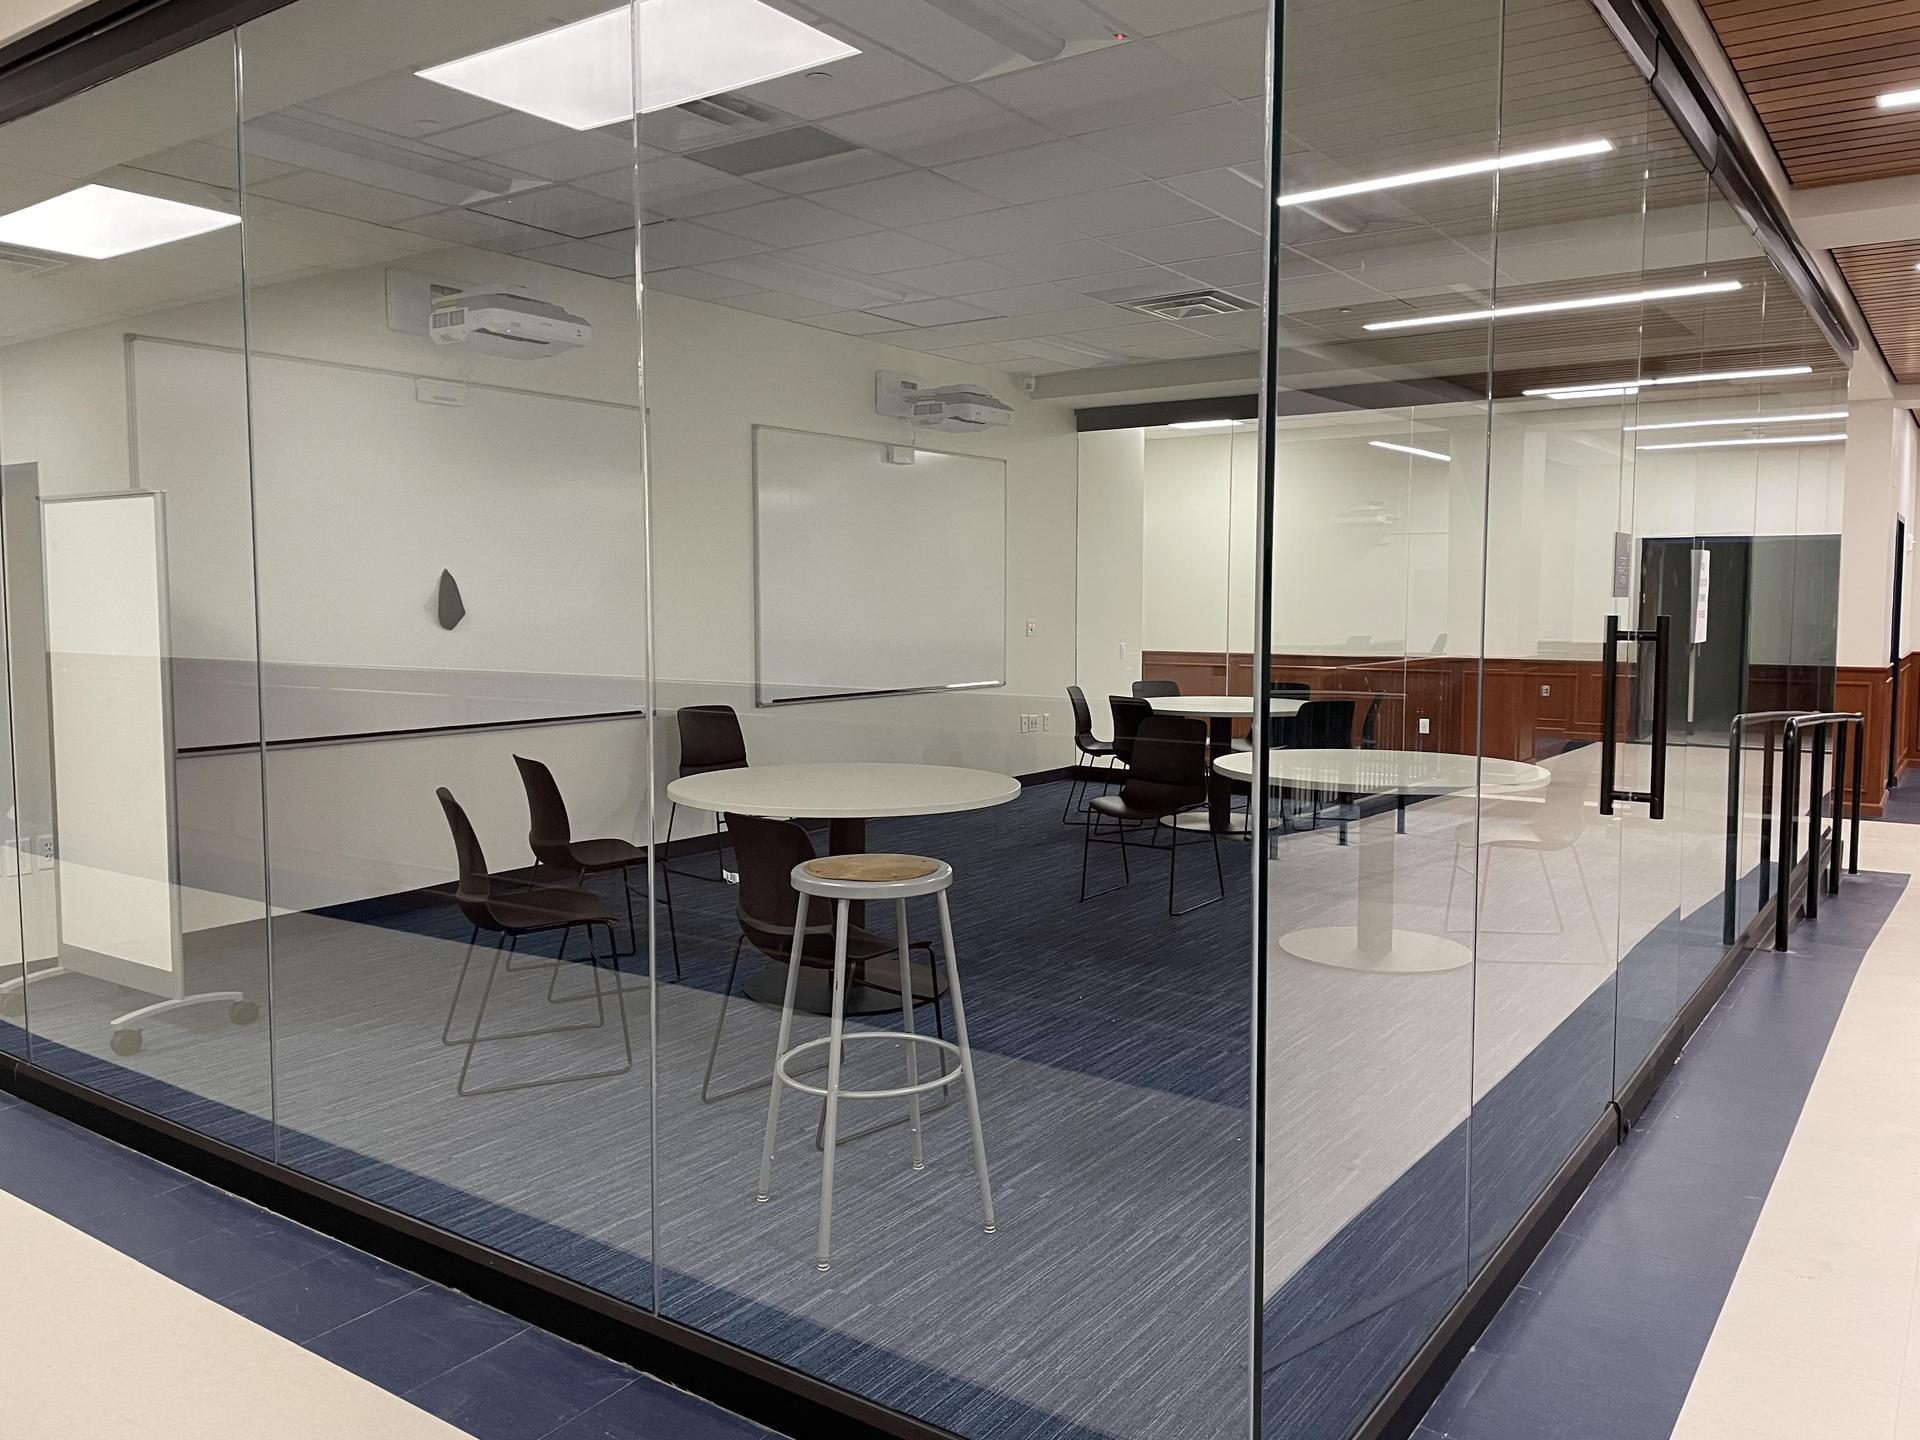 HPHS new classroom 1_012221